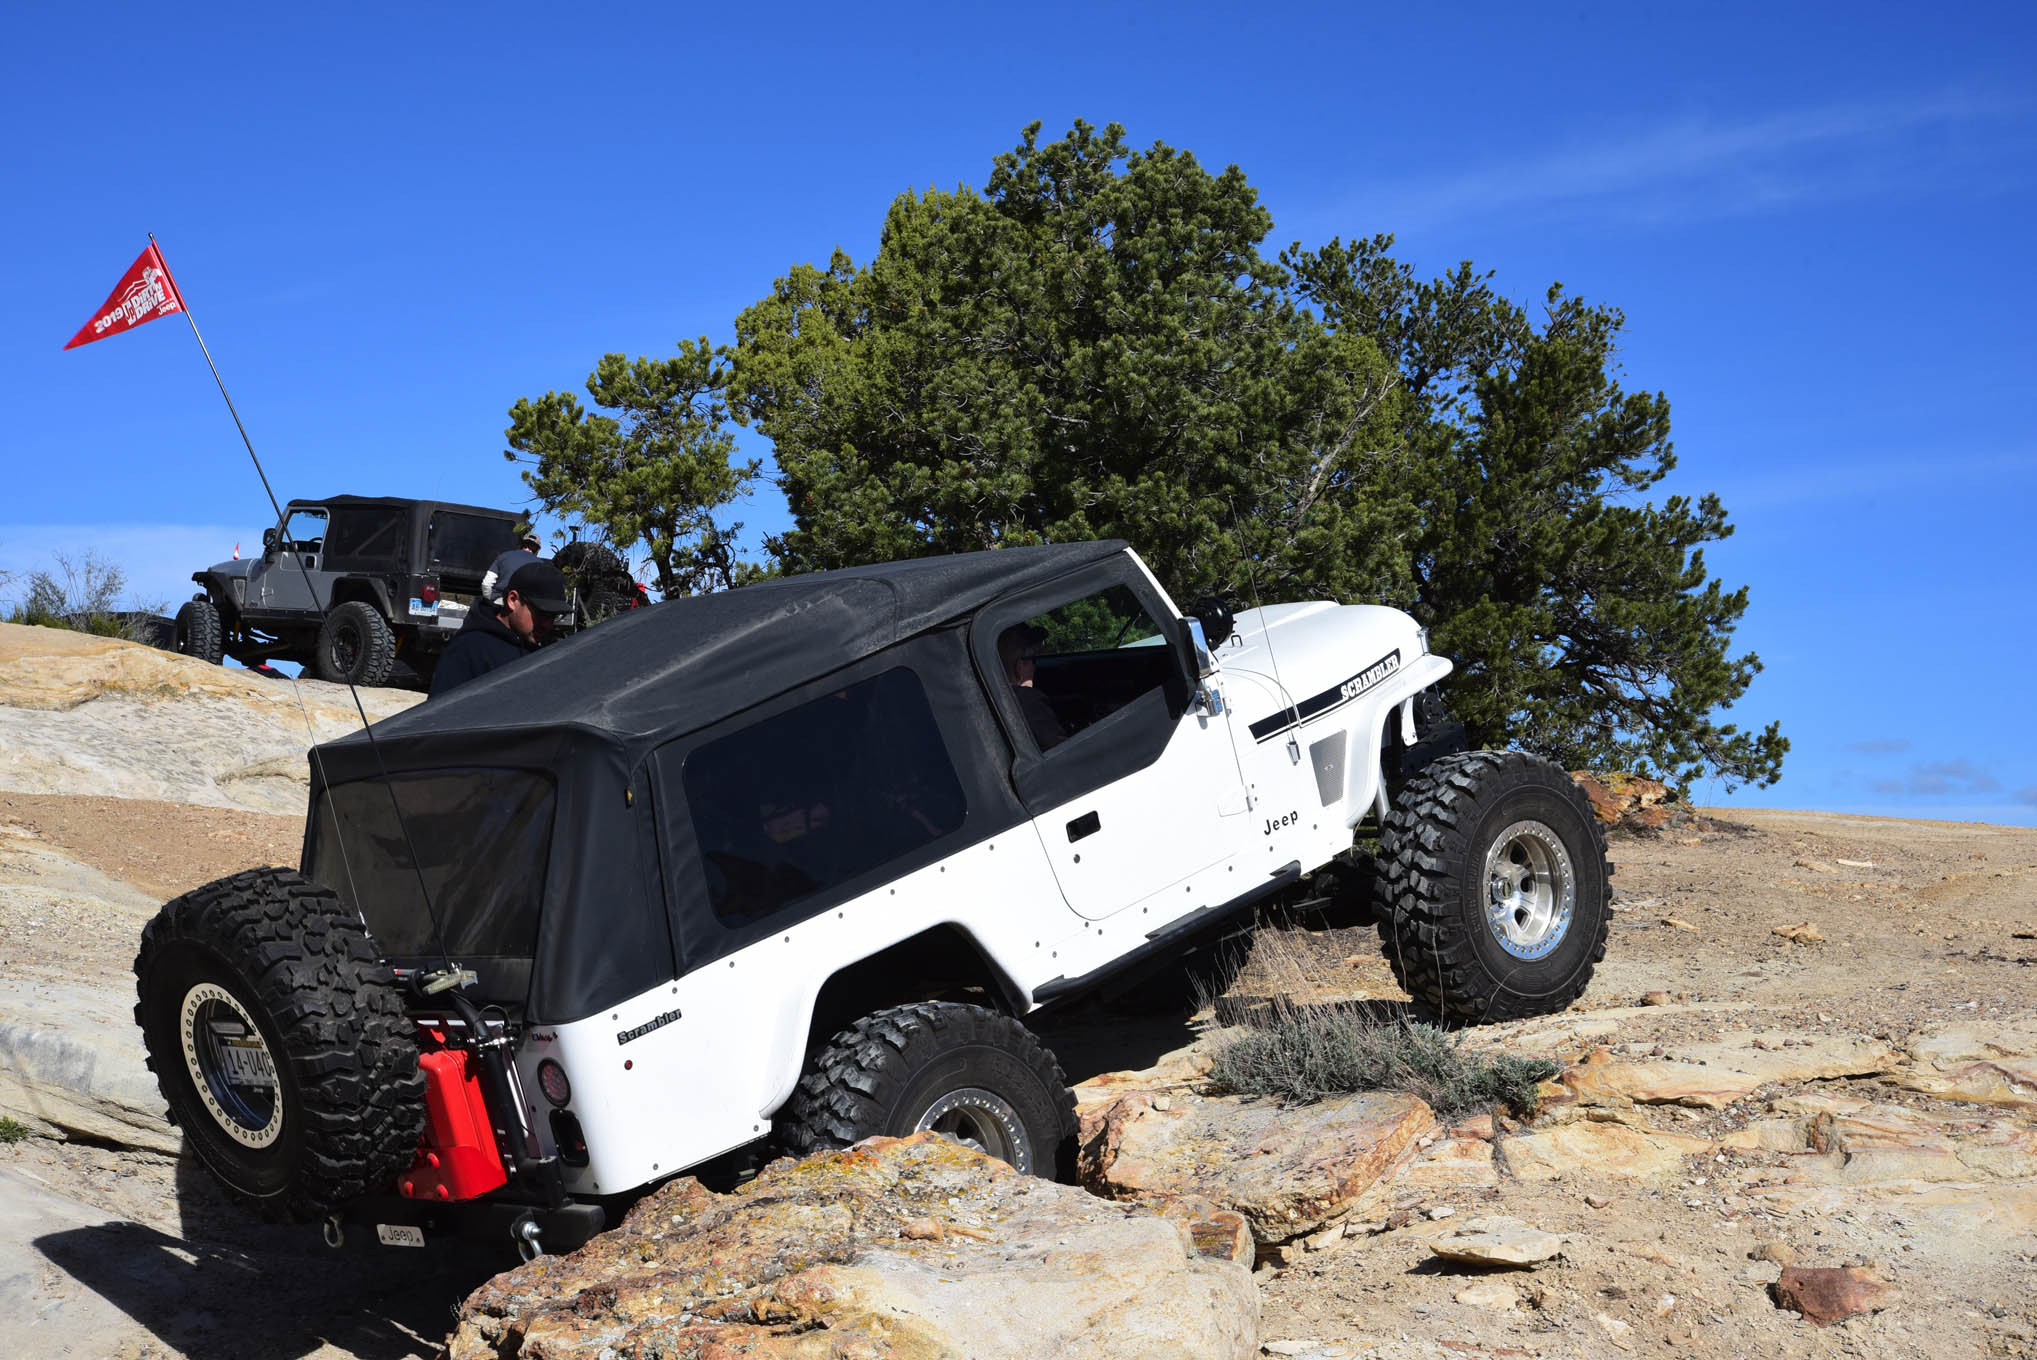 024 jeep 1984 scrambler cj8 cj 8 jp magazine stuart bourdon aaron paris